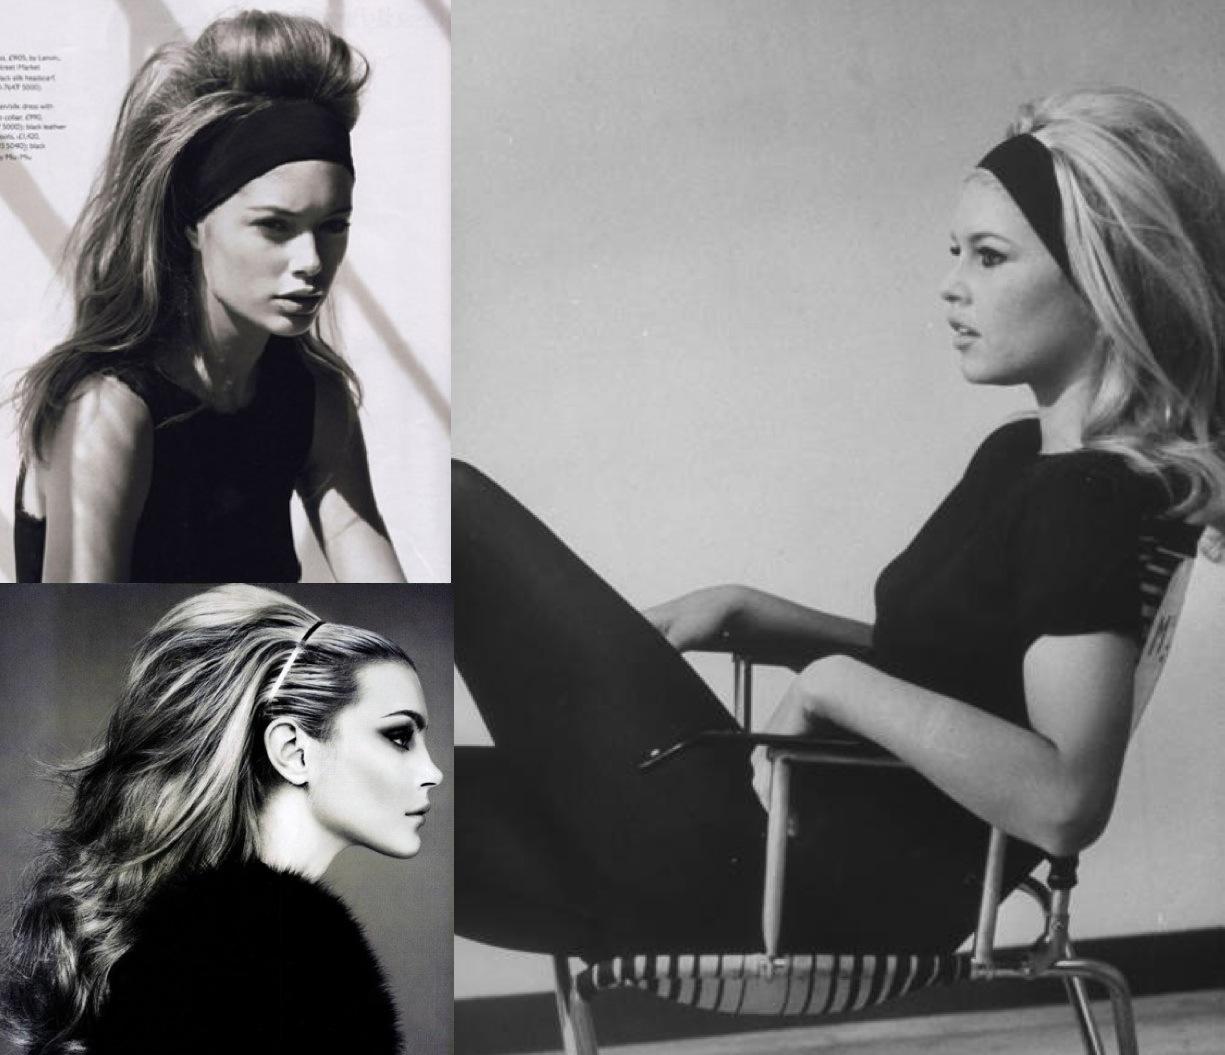 http://4.bp.blogspot.com/_jPsUHRPlxFw/TTzH-inDIVI/AAAAAAAACNg/kGo2CcDF4Gw/s1600/Bardot+in+a+headband+teased+-+models.jpg